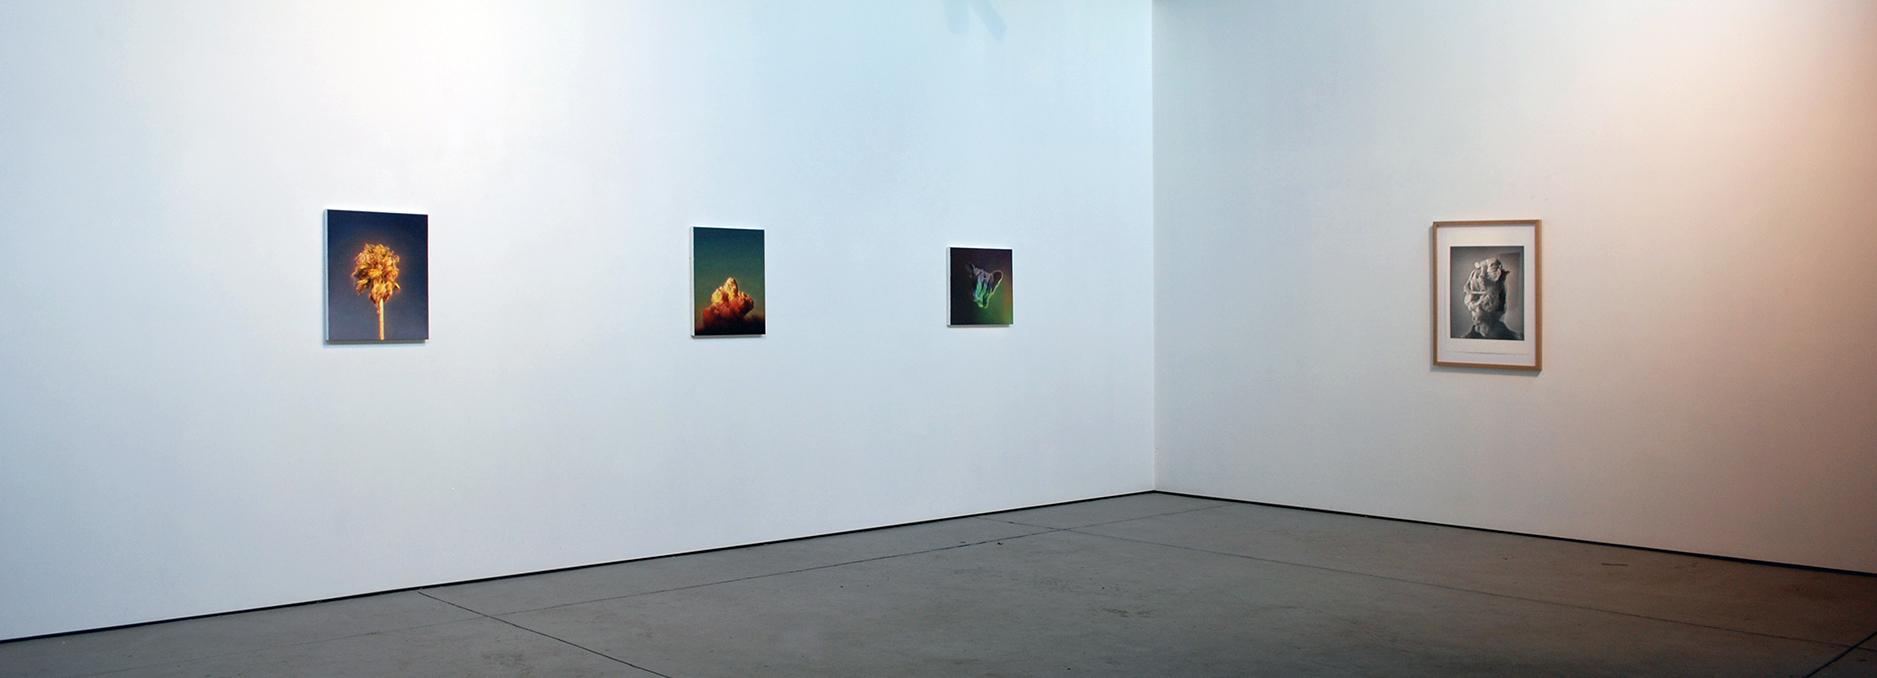 James Bonnici installation Lindberg Galleries 2018